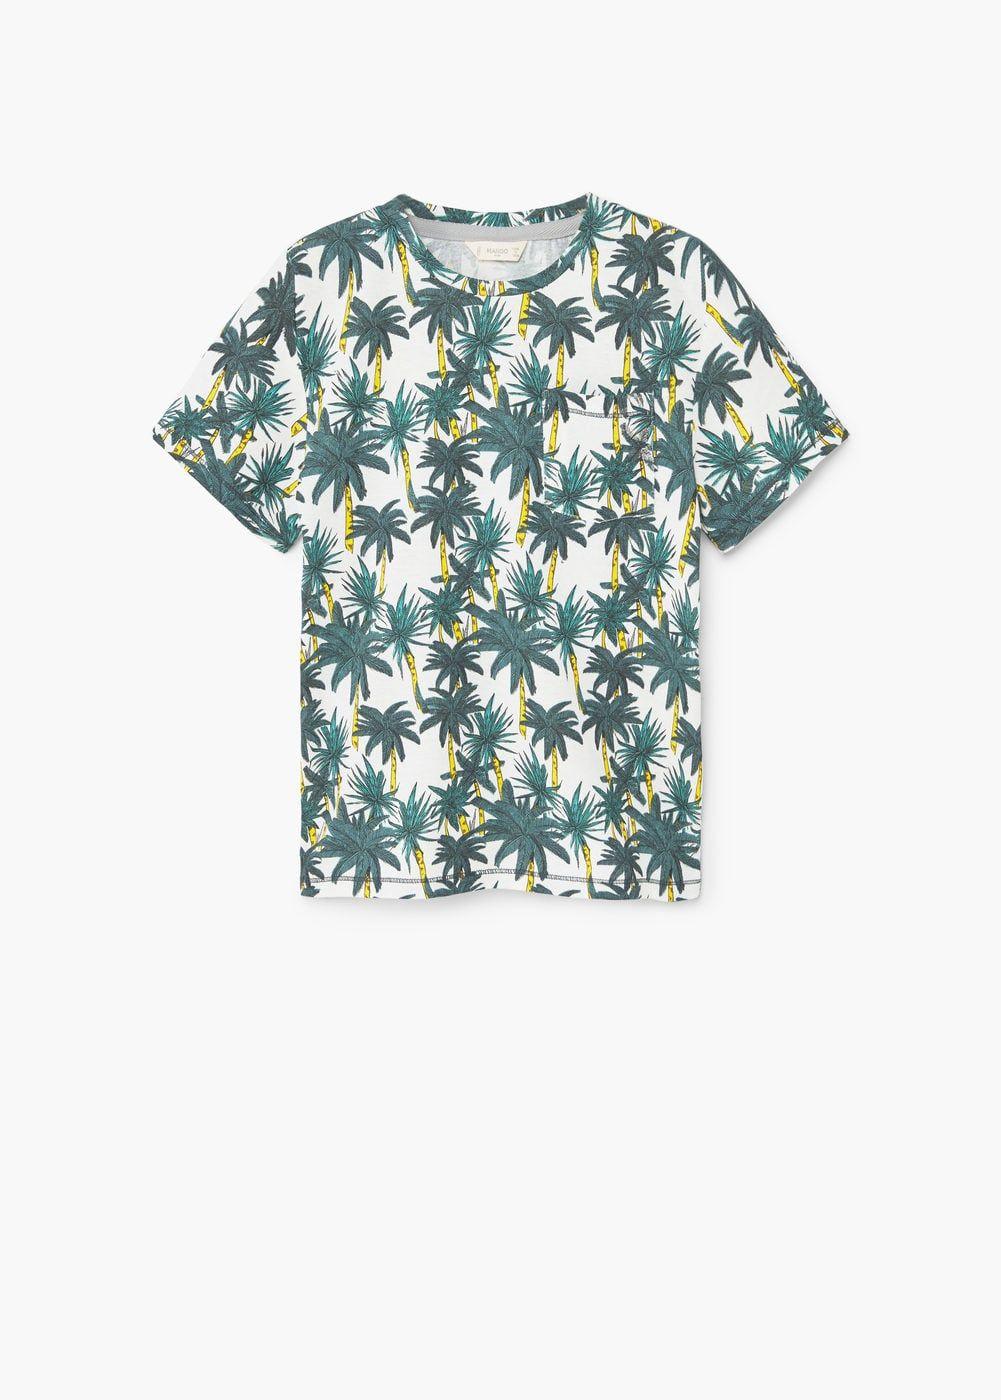 b800cbd9cf Camiseta estampado palmeras - Niño | regalos hugo | Camisetas ...